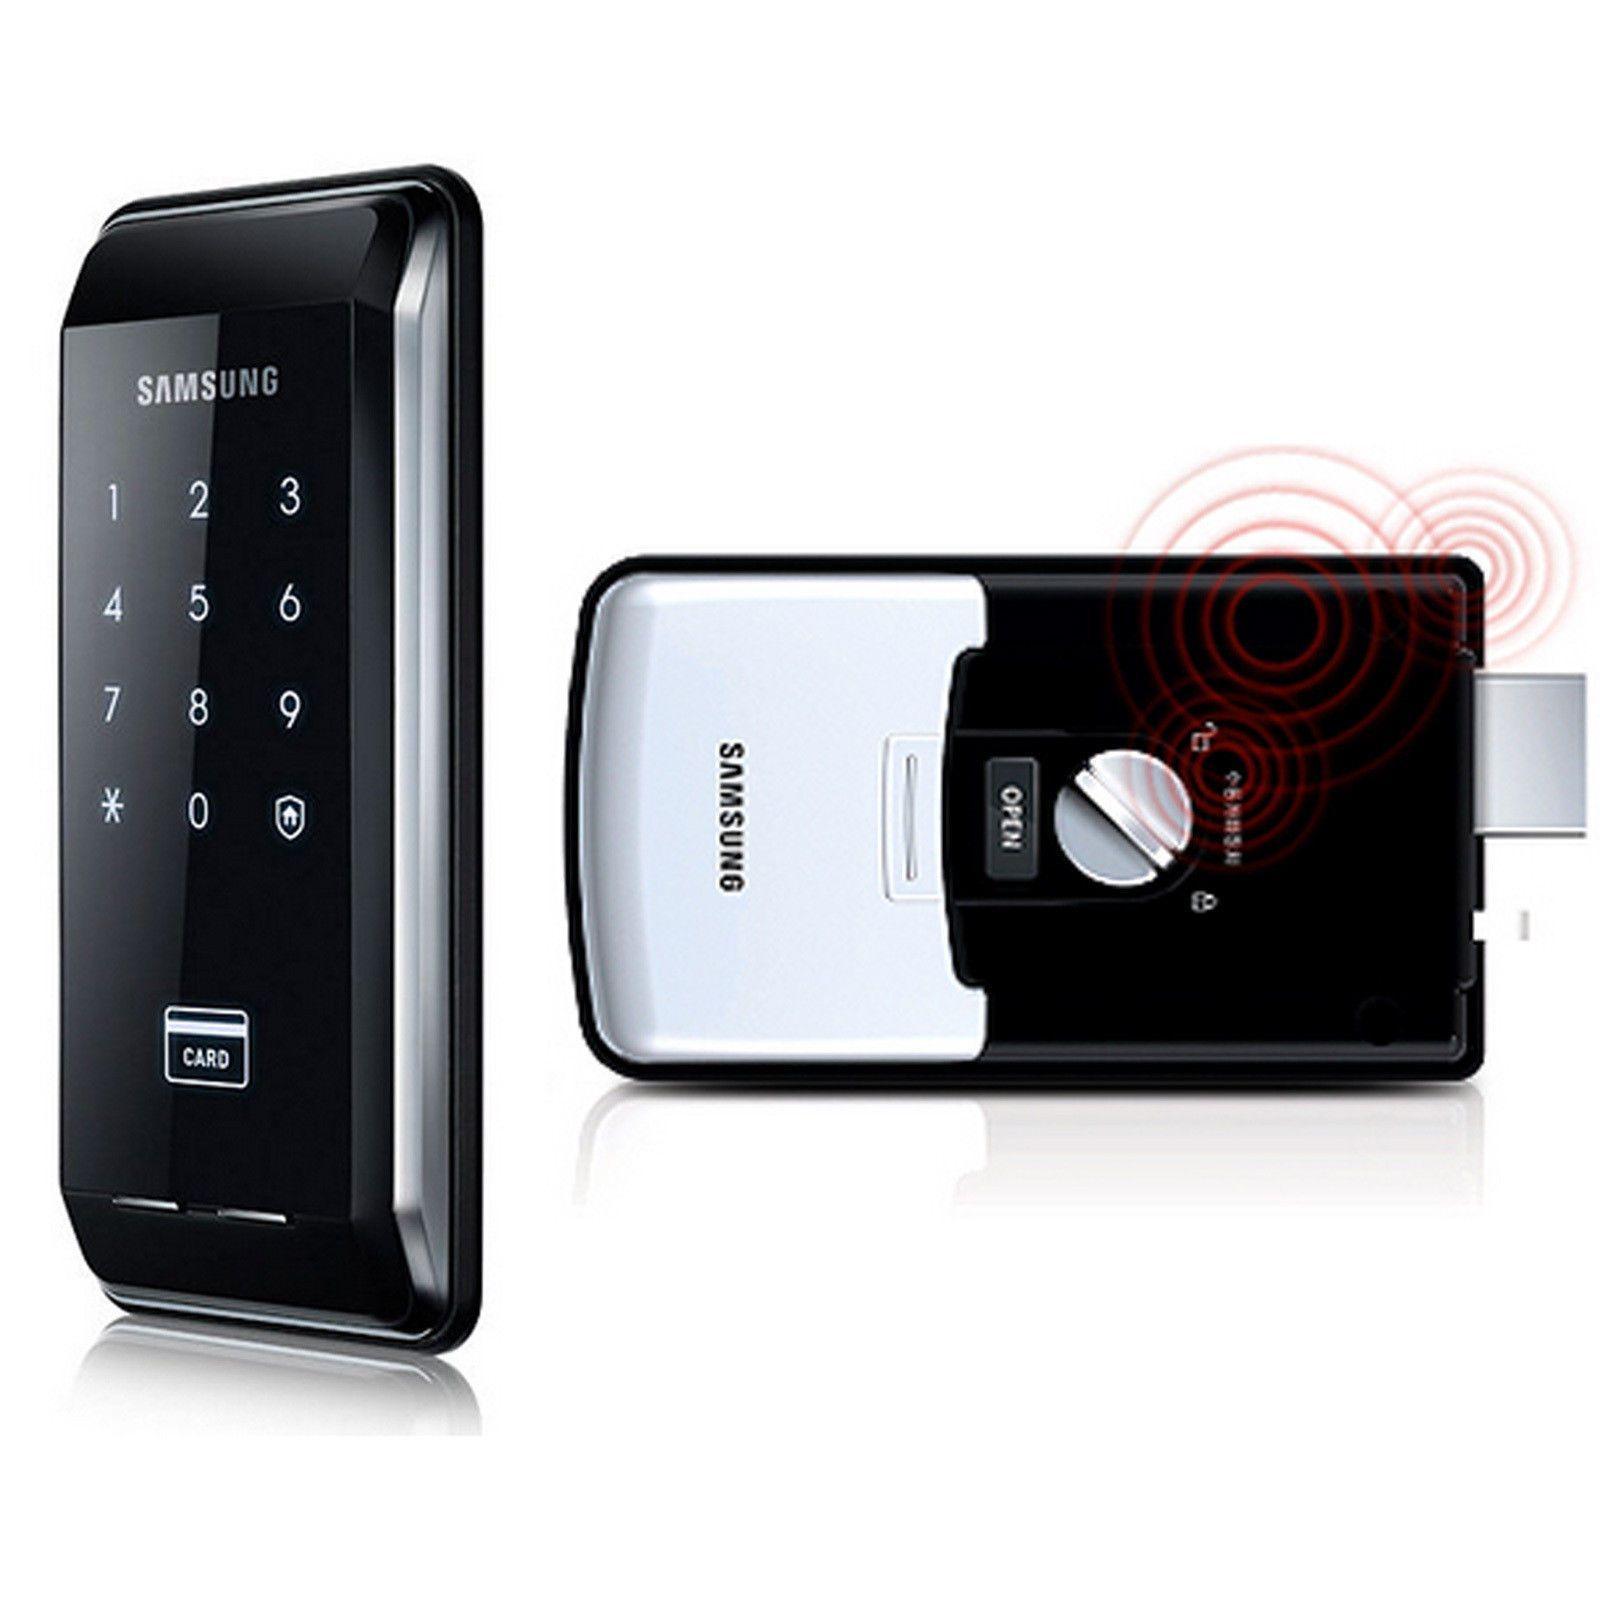 Samsung Digital Door Lock SHS-2920 Ezon Black keyless Security English Manual